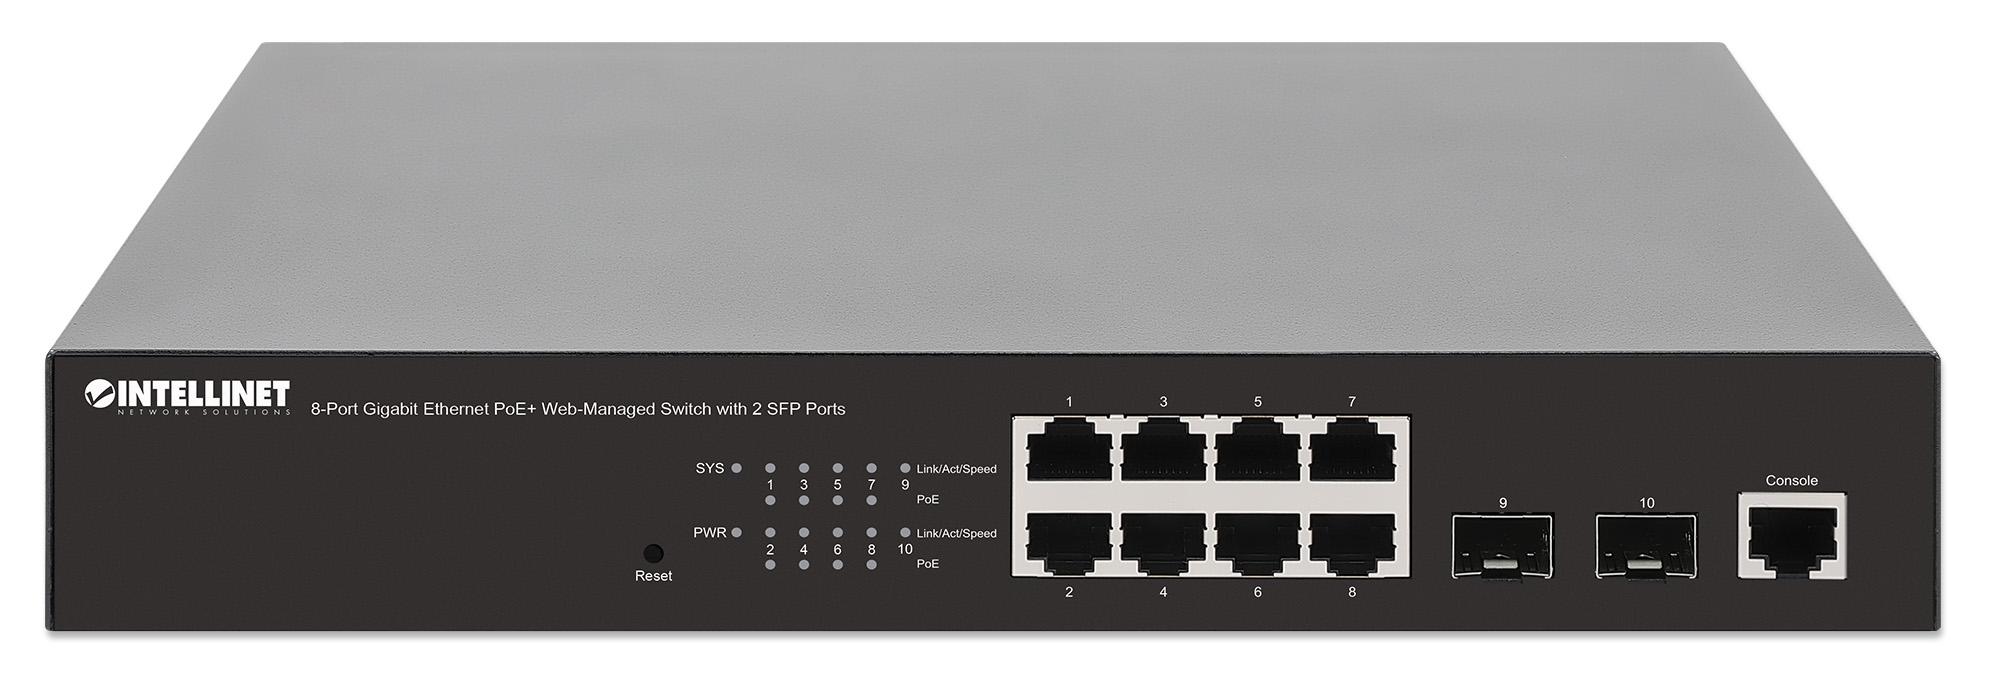 8-Port Gigabit Ethernet PoE+ Web-Managed Switch with 2 SFP Ports